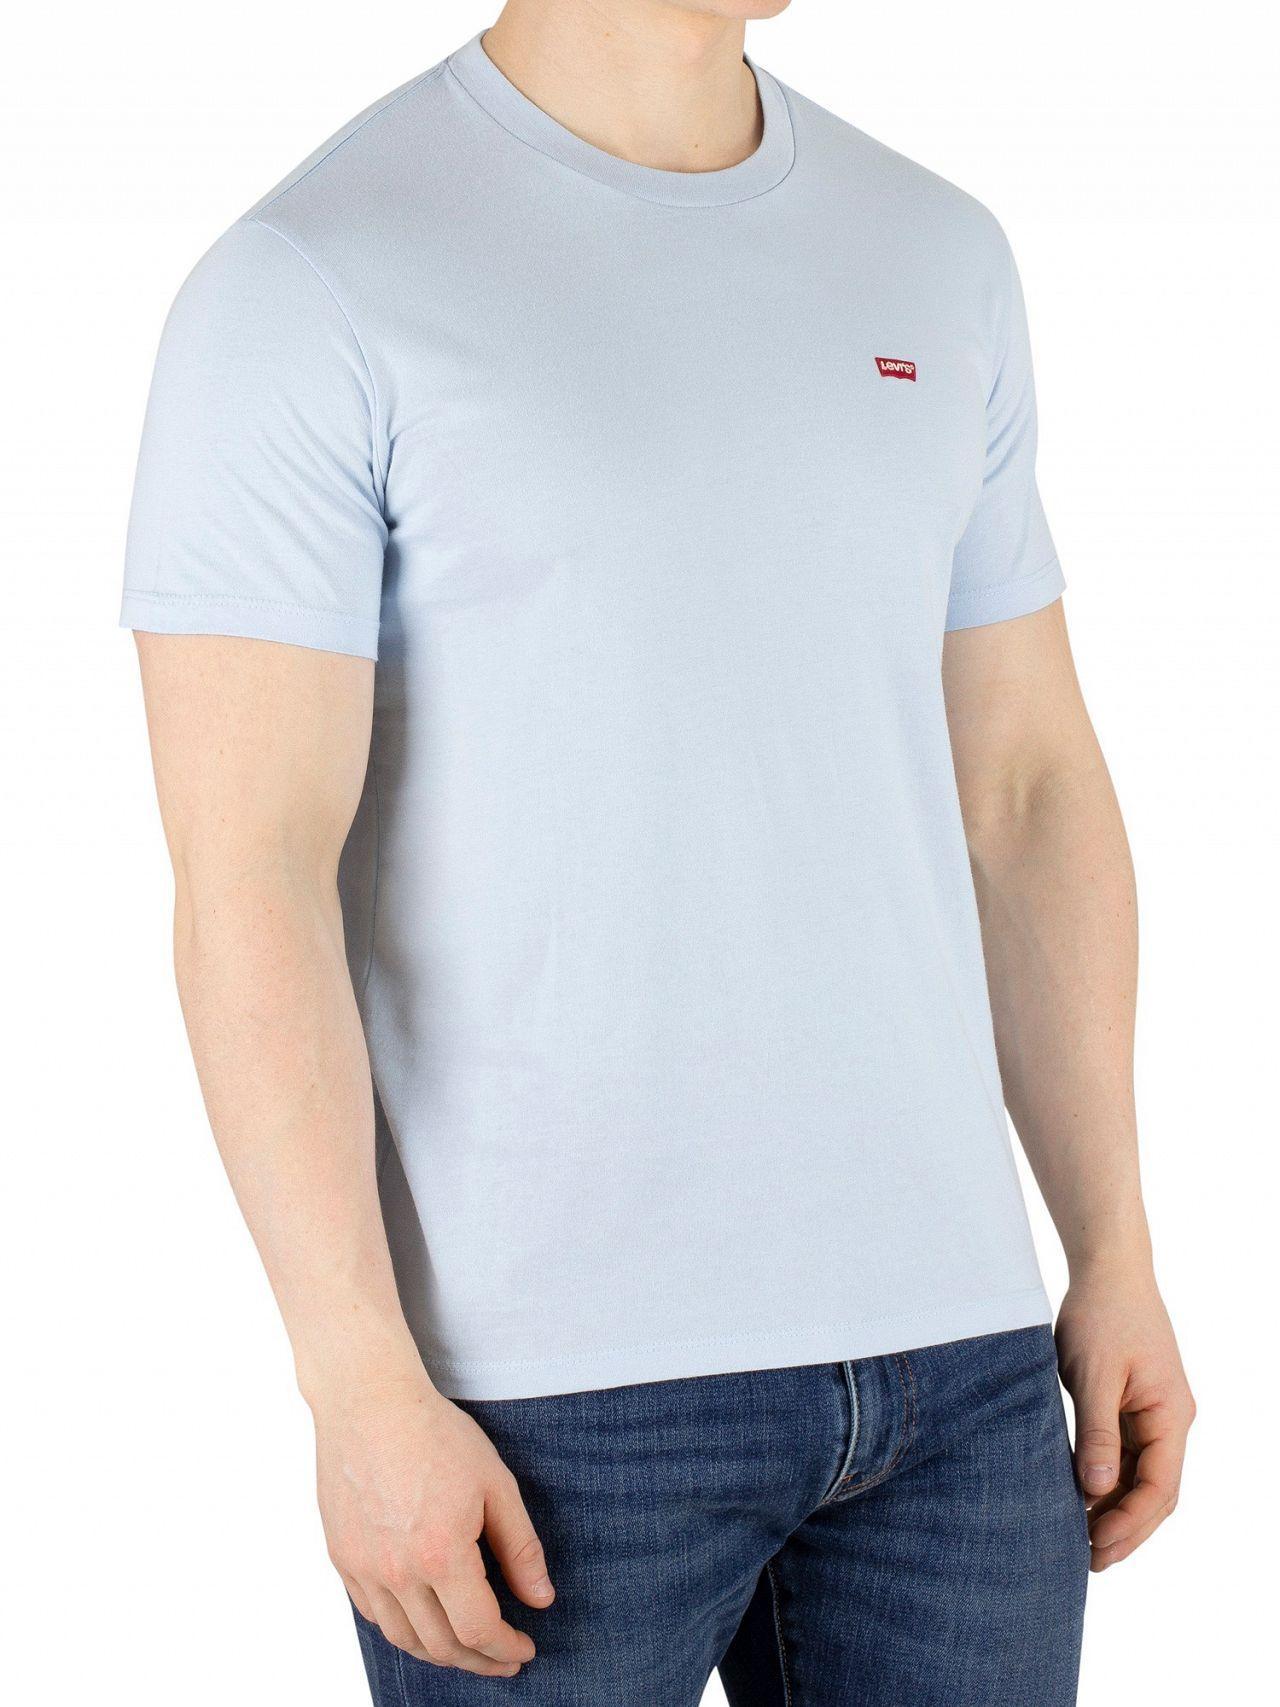 5146dbf976e Levi's Skyway Original T-shirt in Blue for Men - Lyst